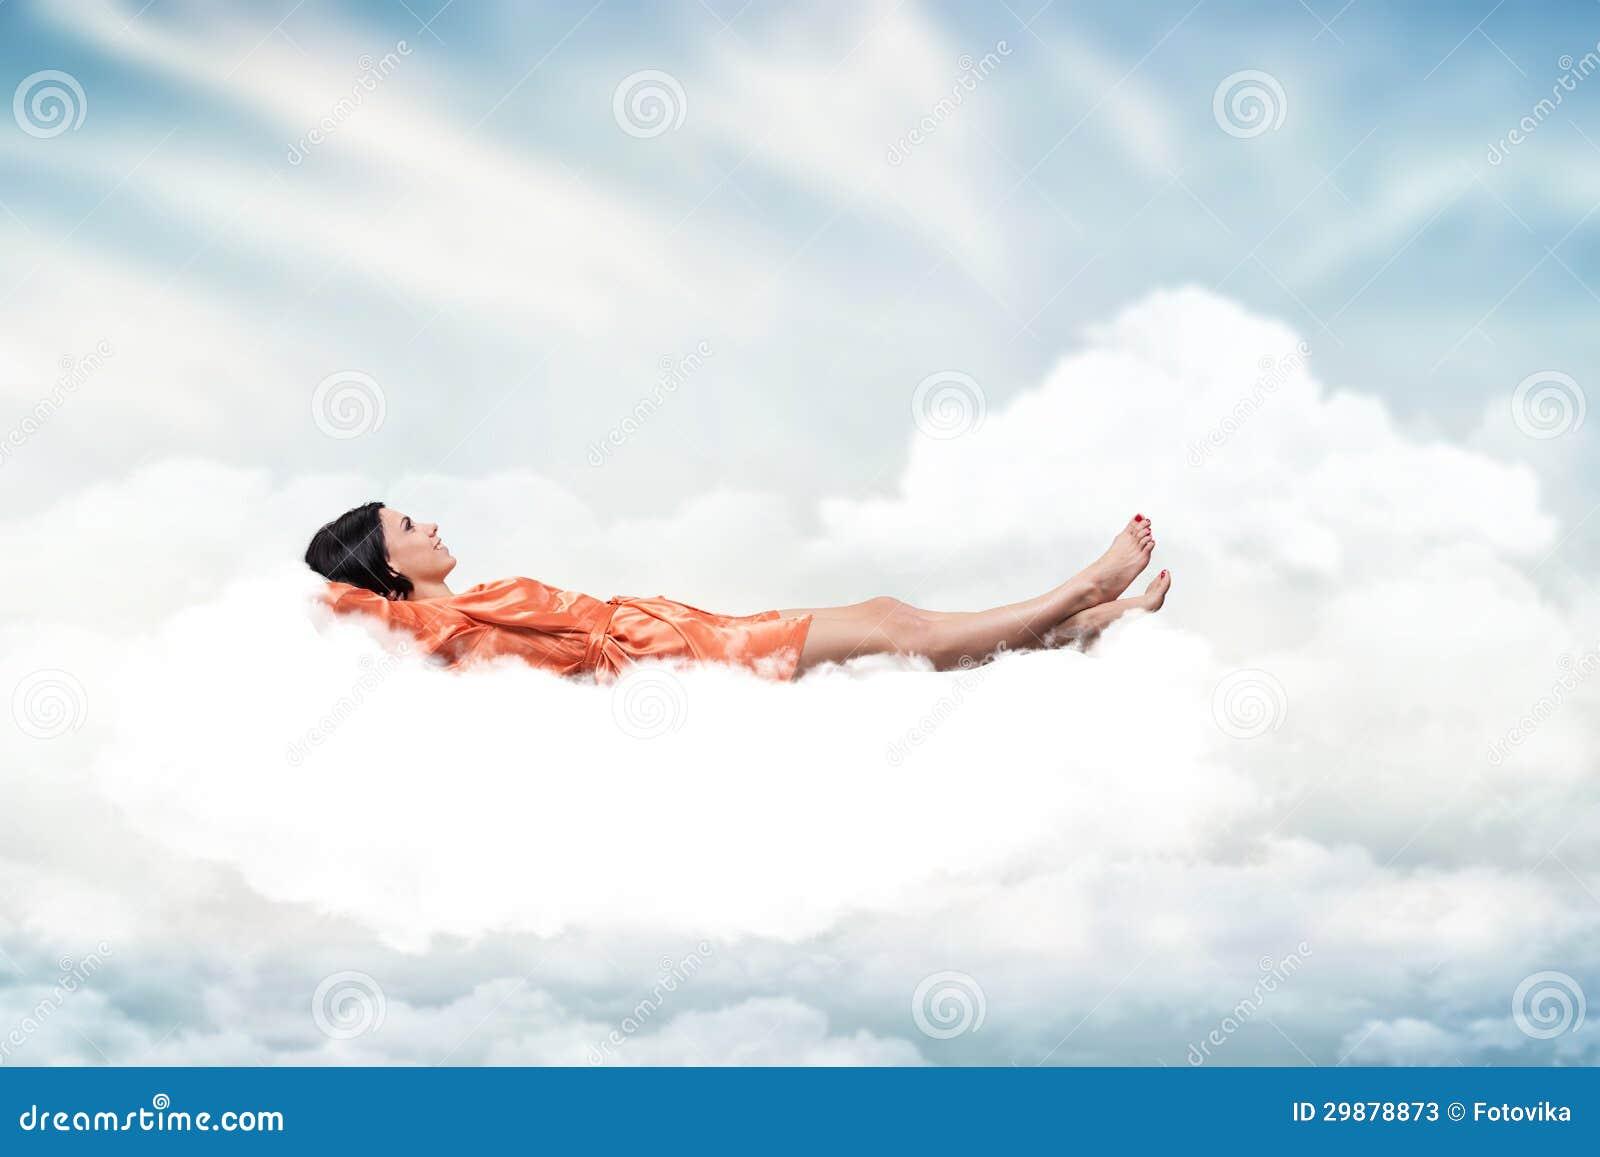 Girl On A Cloud Stock Photos - Image: 29878873